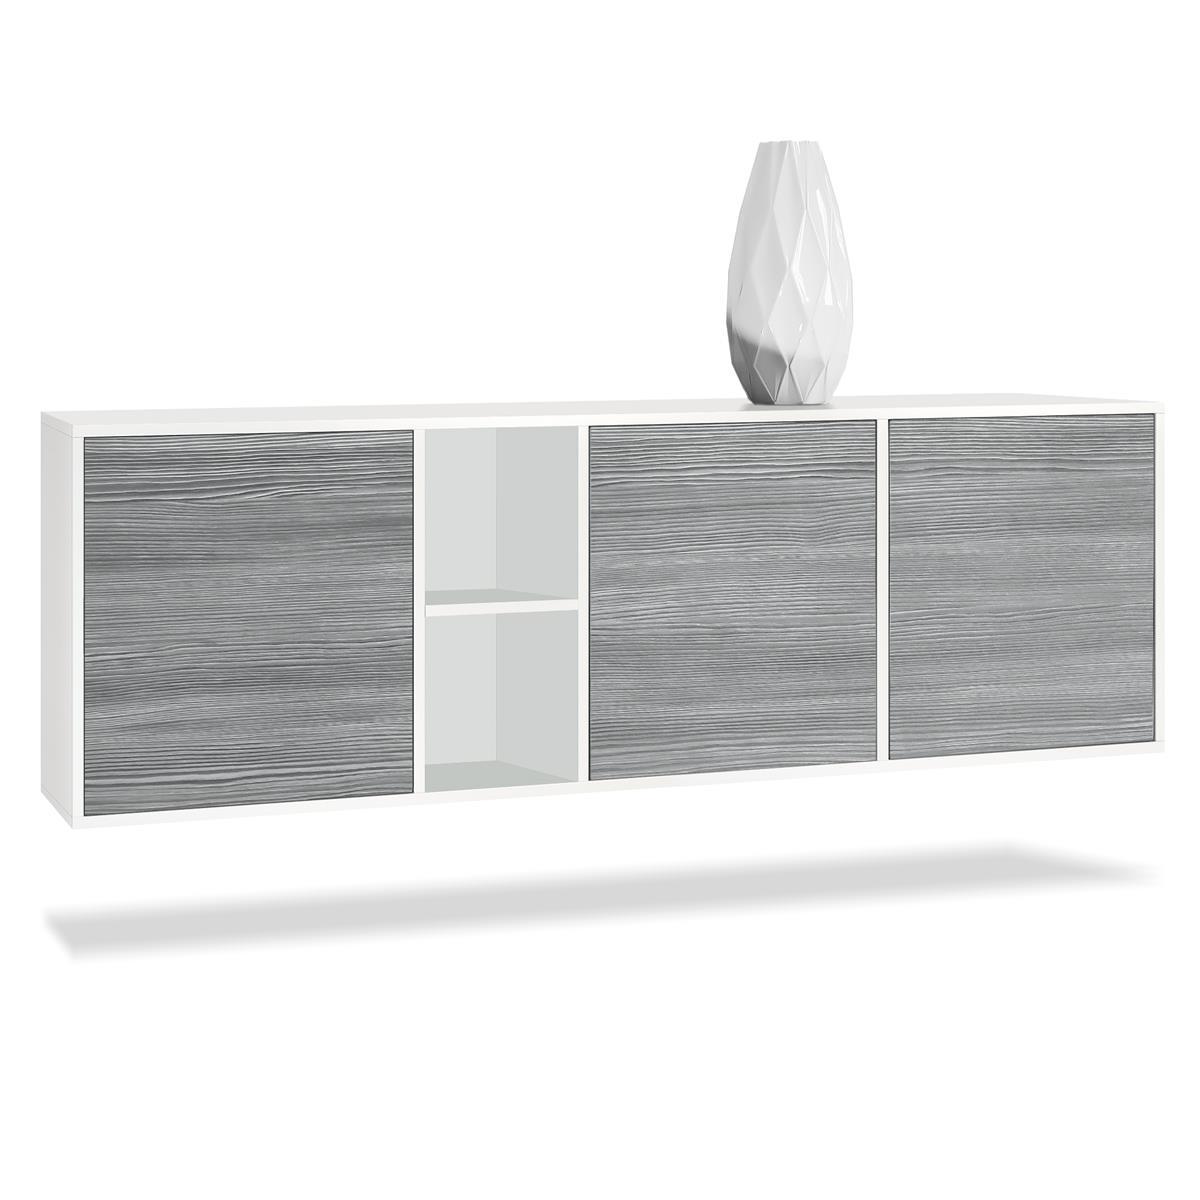 Hangendes Sideboard Cuba Breite 182cm Vladon Mobel